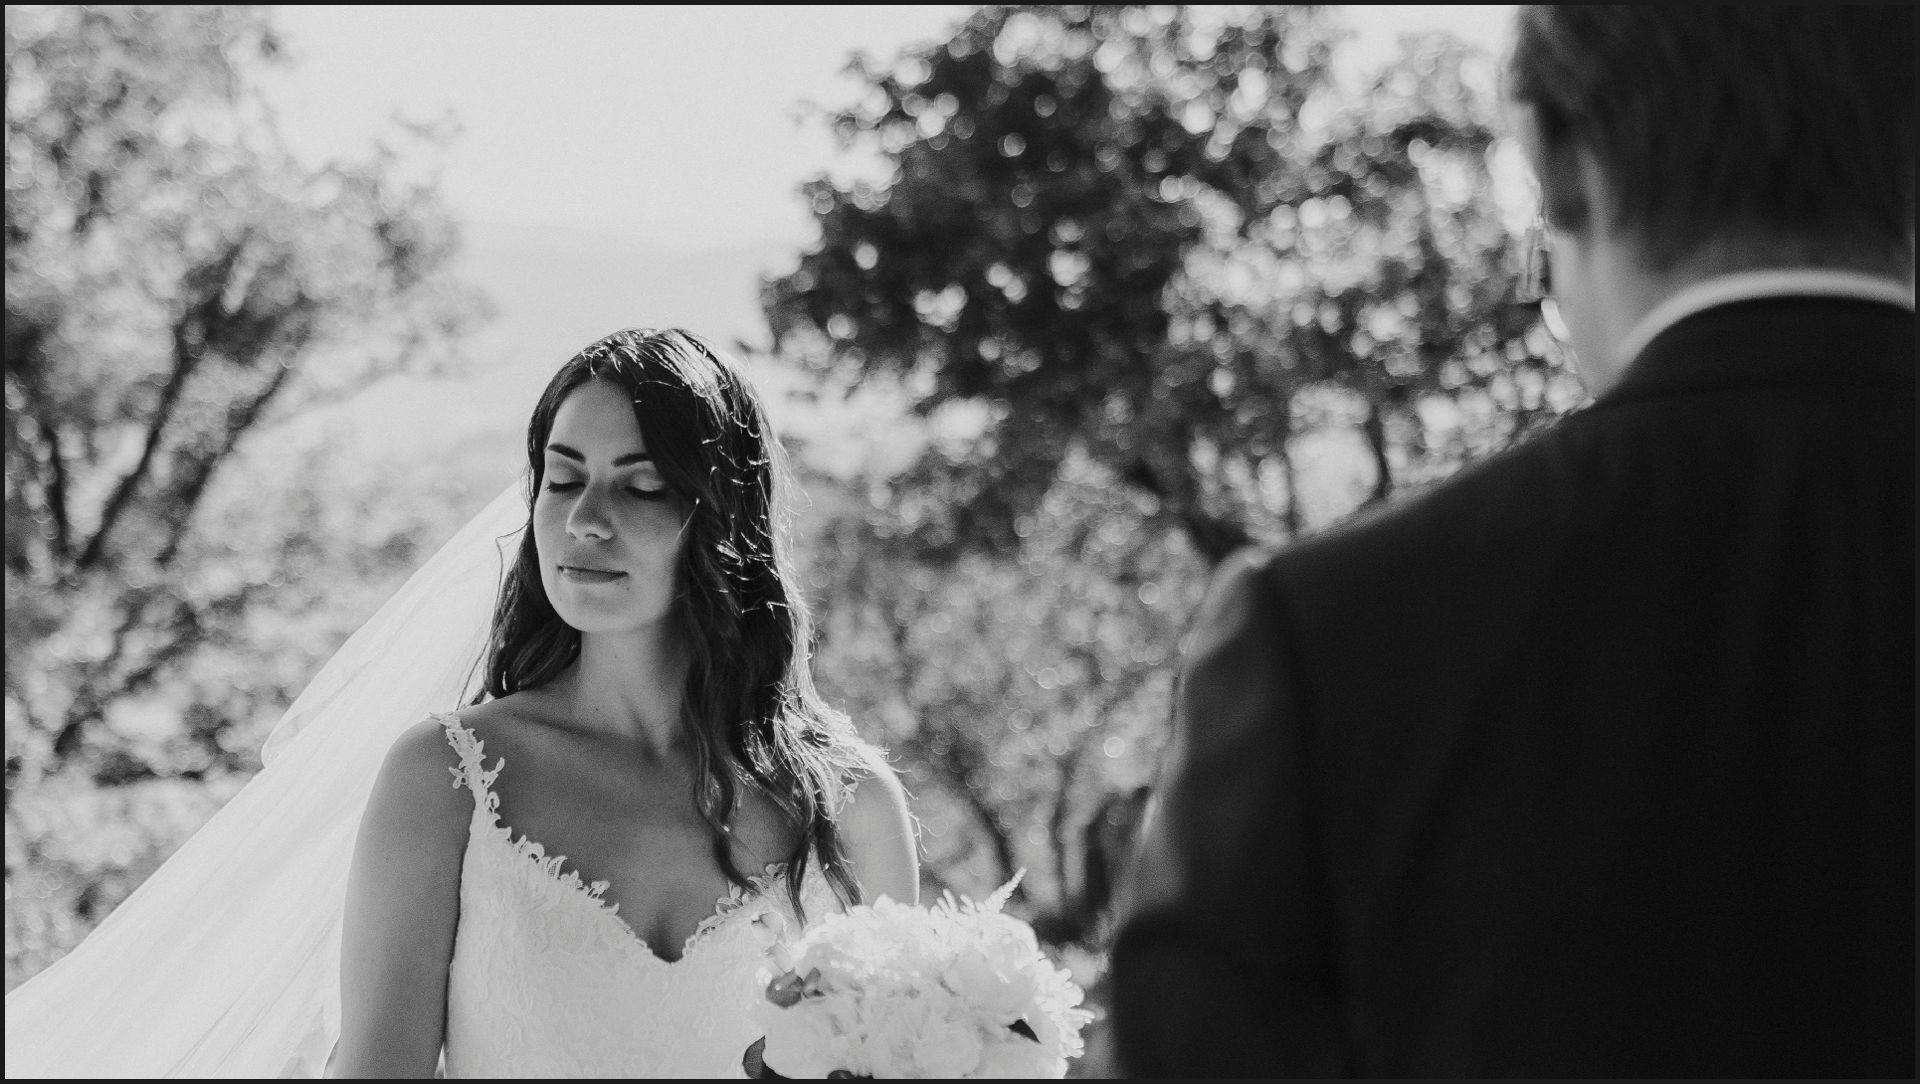 black and white, wedding, umbria, nikis resort, bride, groom, veil, sun